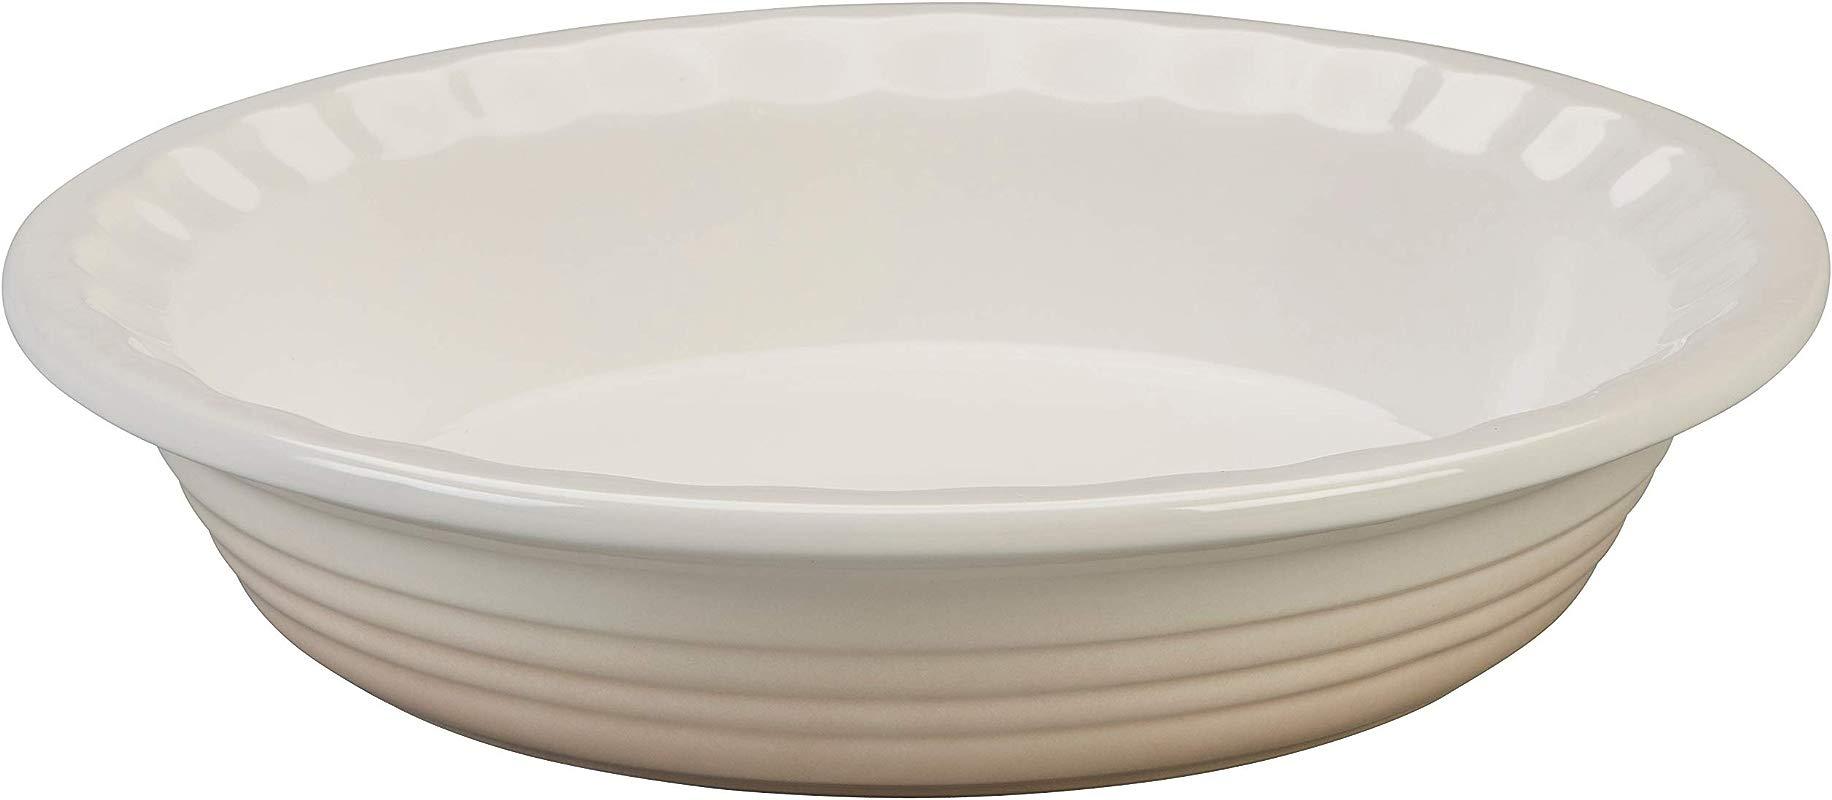 Le Creuset Heritage Meringue Stoneware 9 Inch Pie Pan